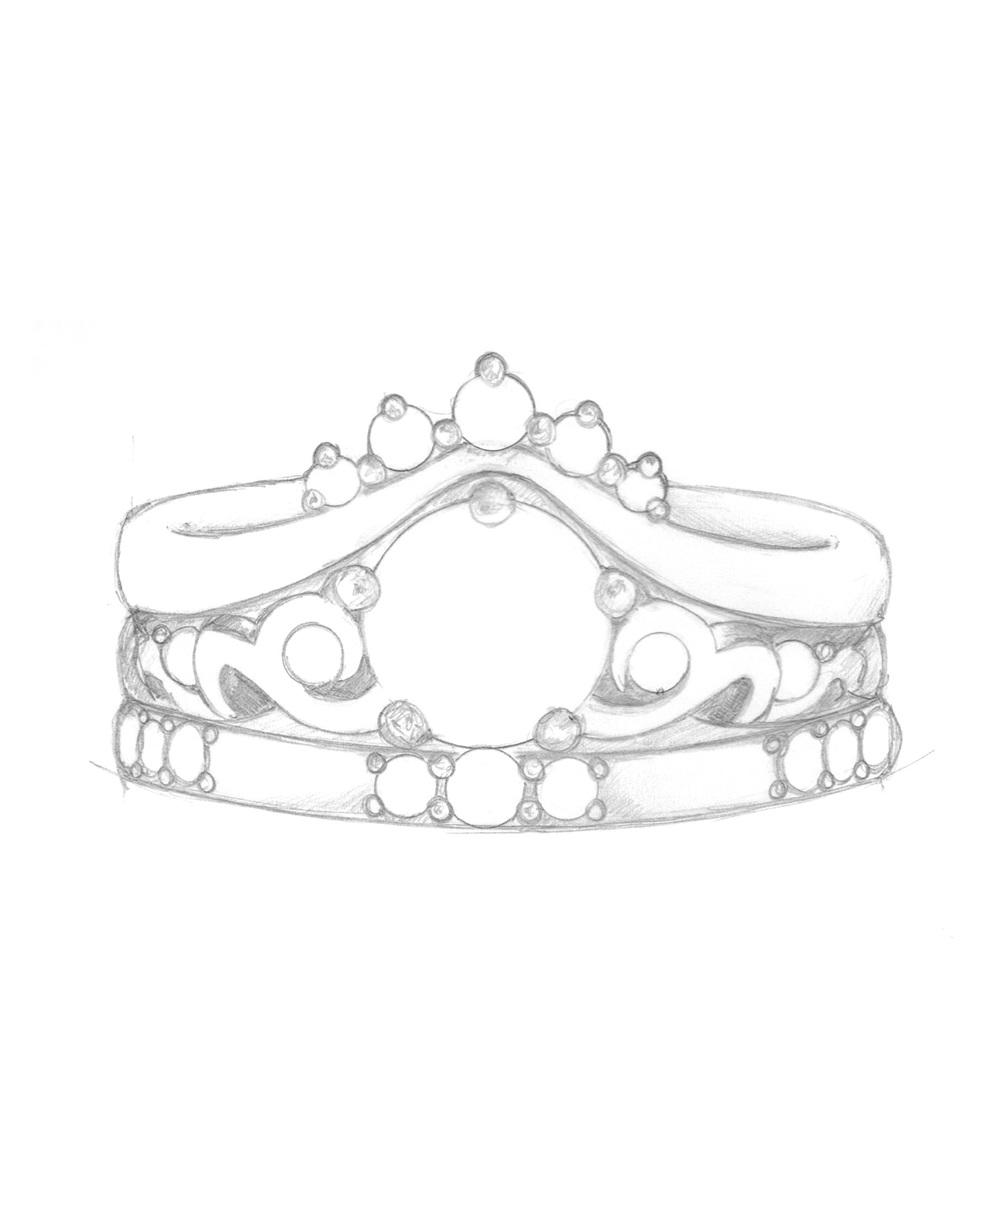 Valentina - Bespoke Jewellery Design (3) discover.jpg